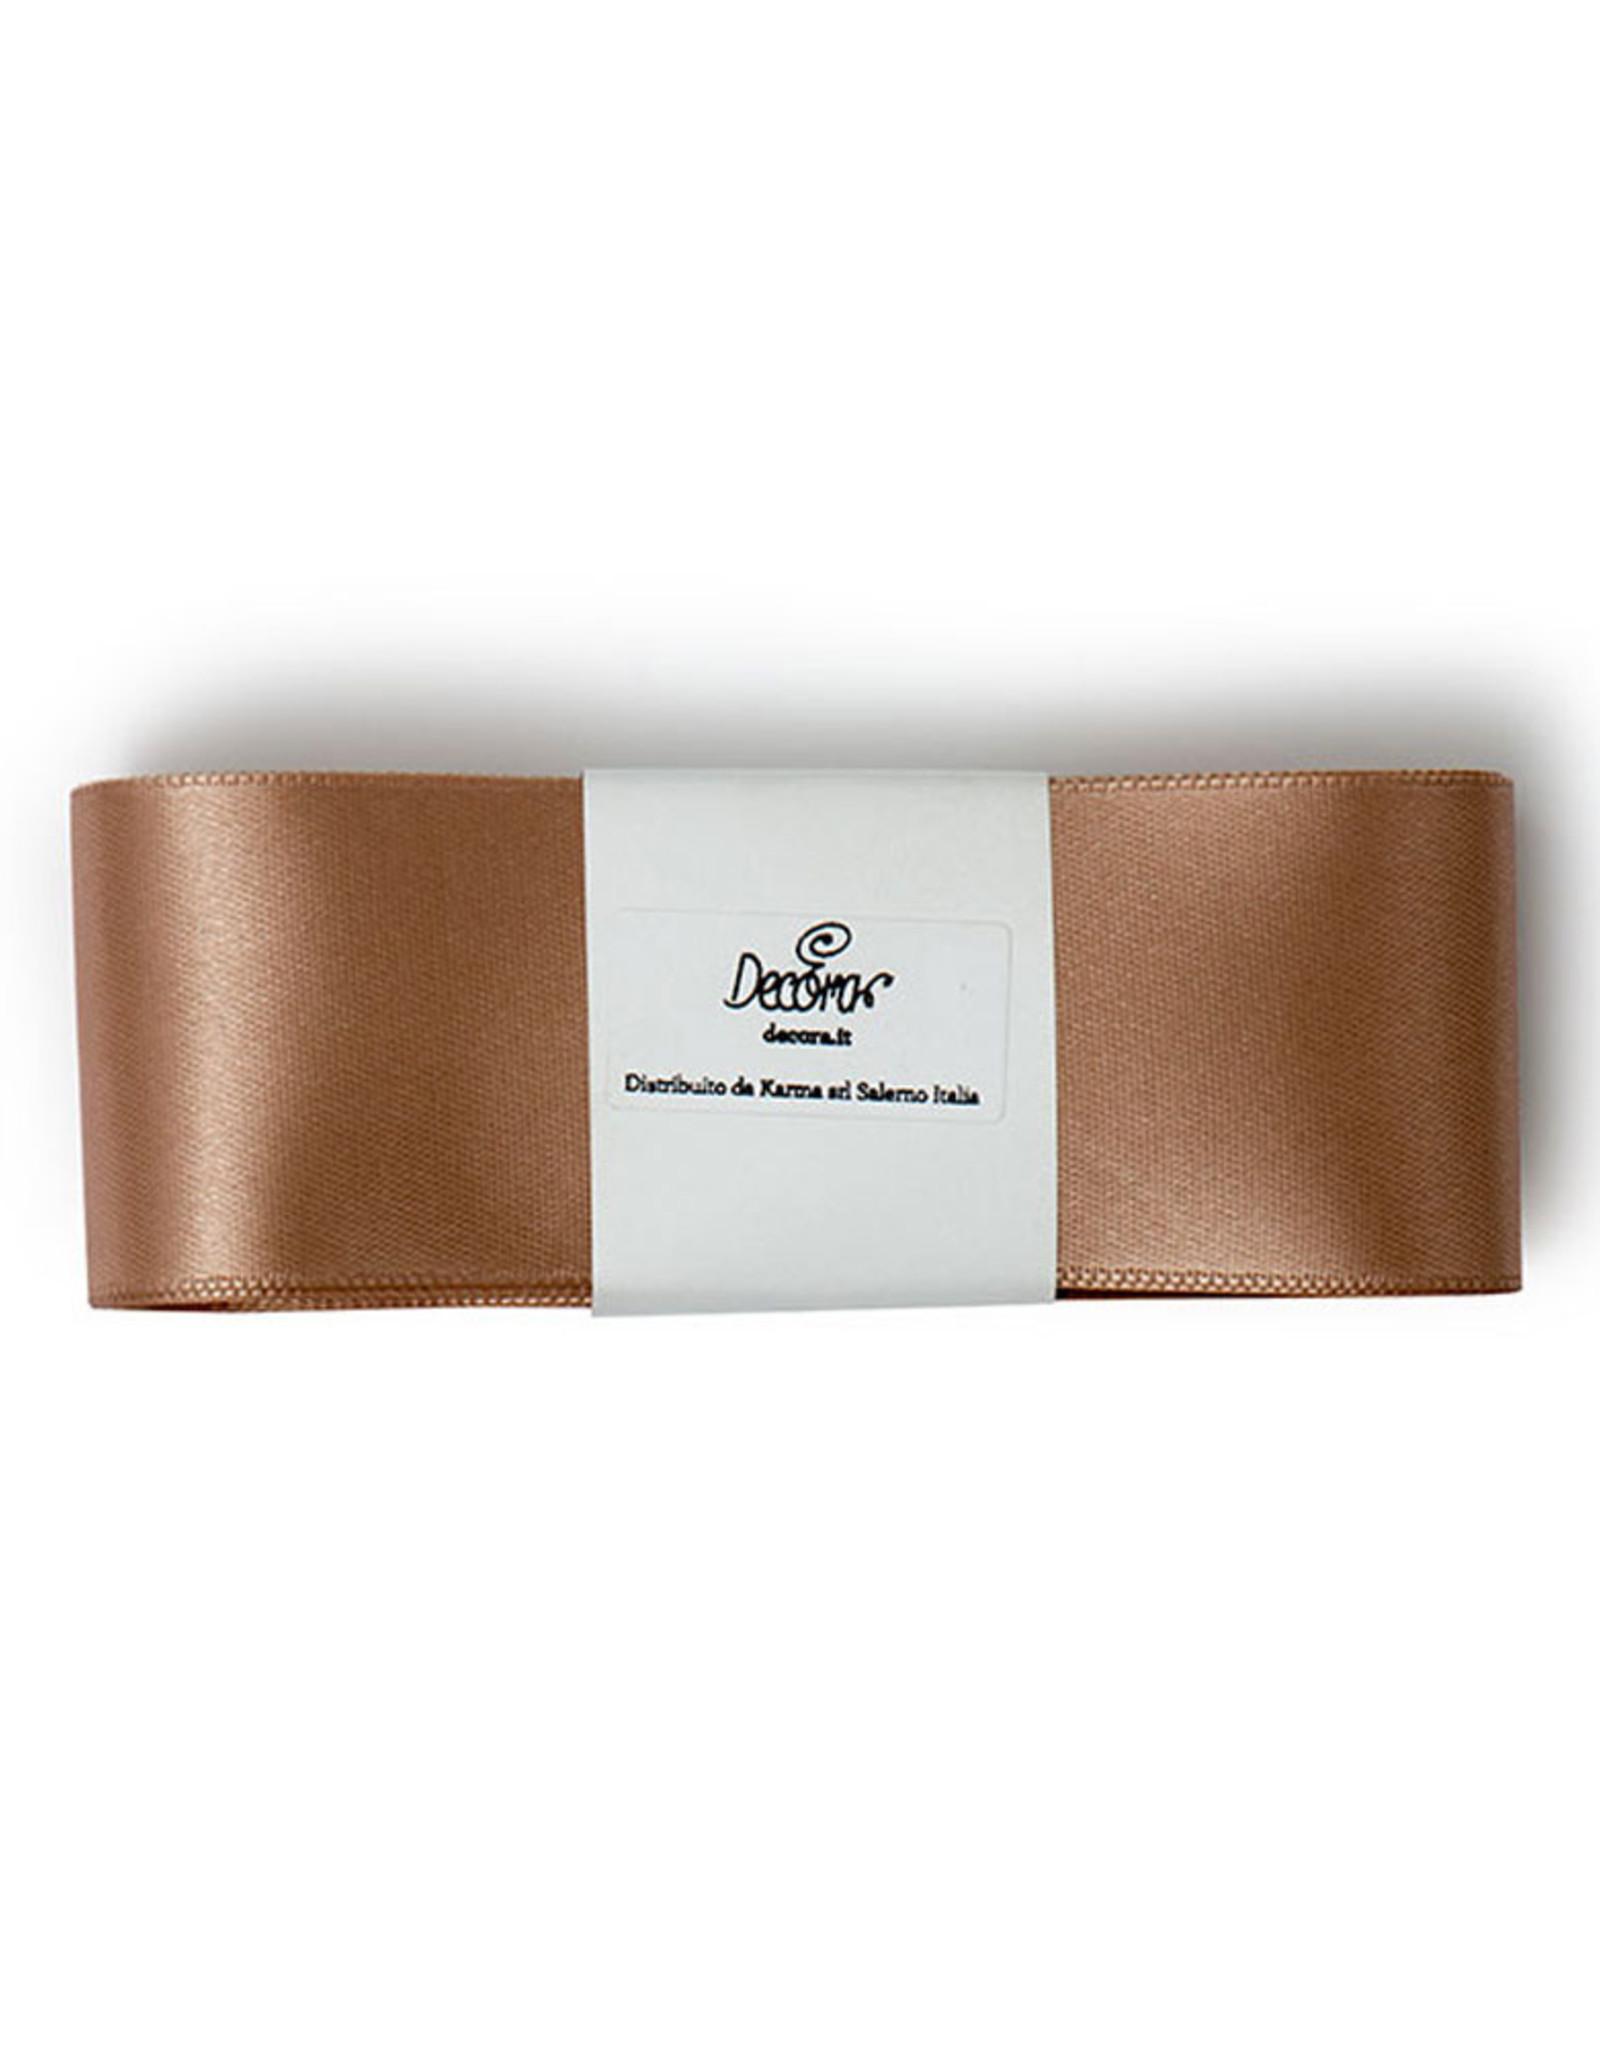 Double Satin Ribbon 40mm x 3mtr Caffe Latte